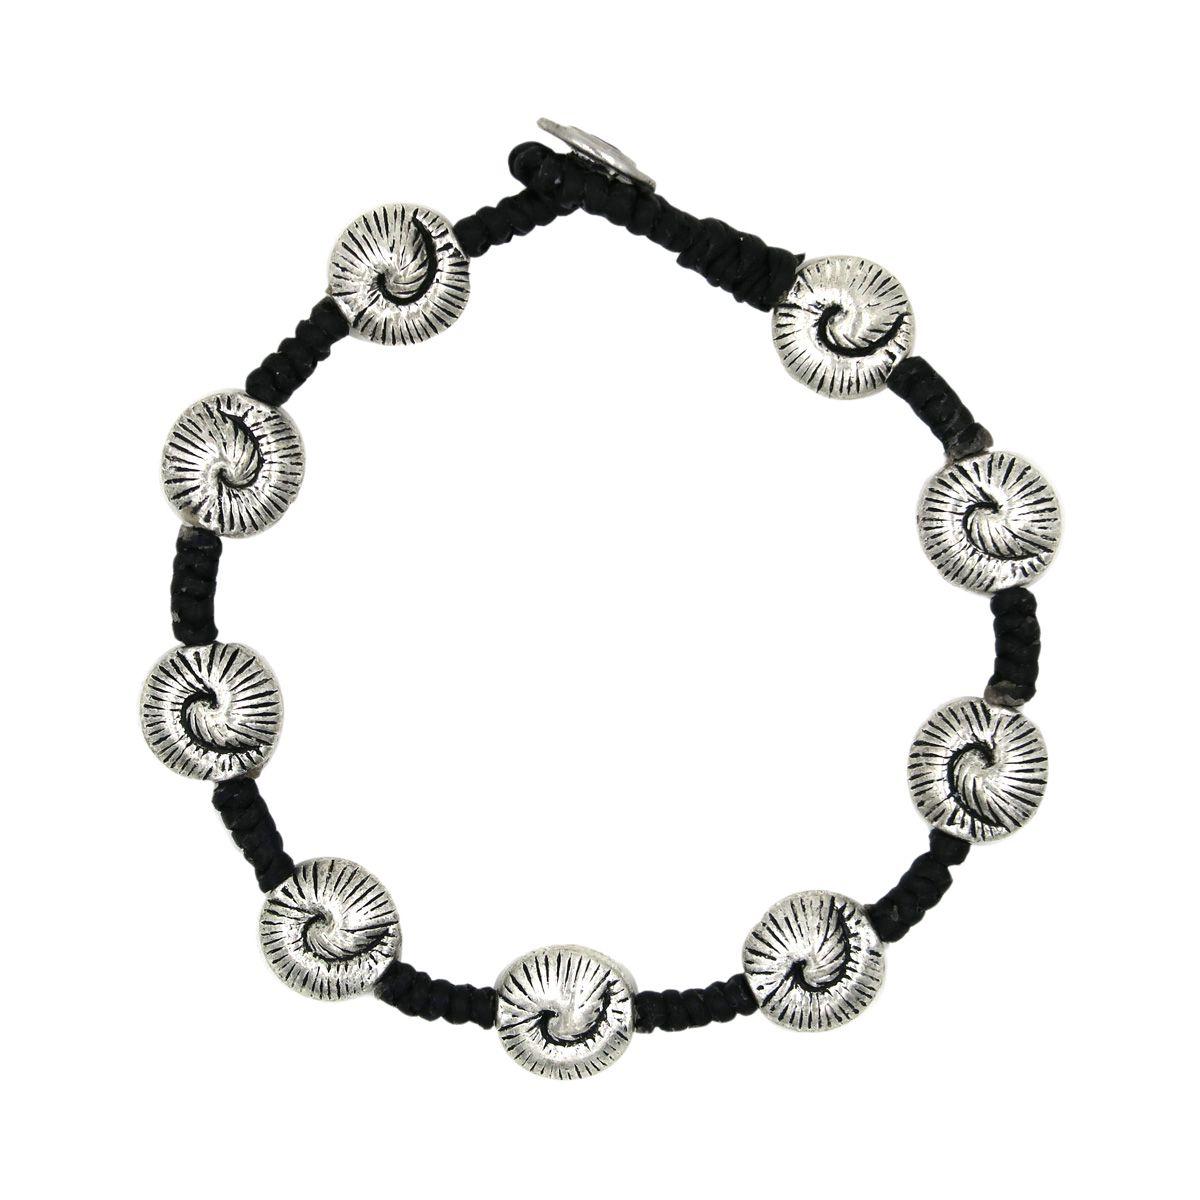 Full Metal Bracelet Snail Sku